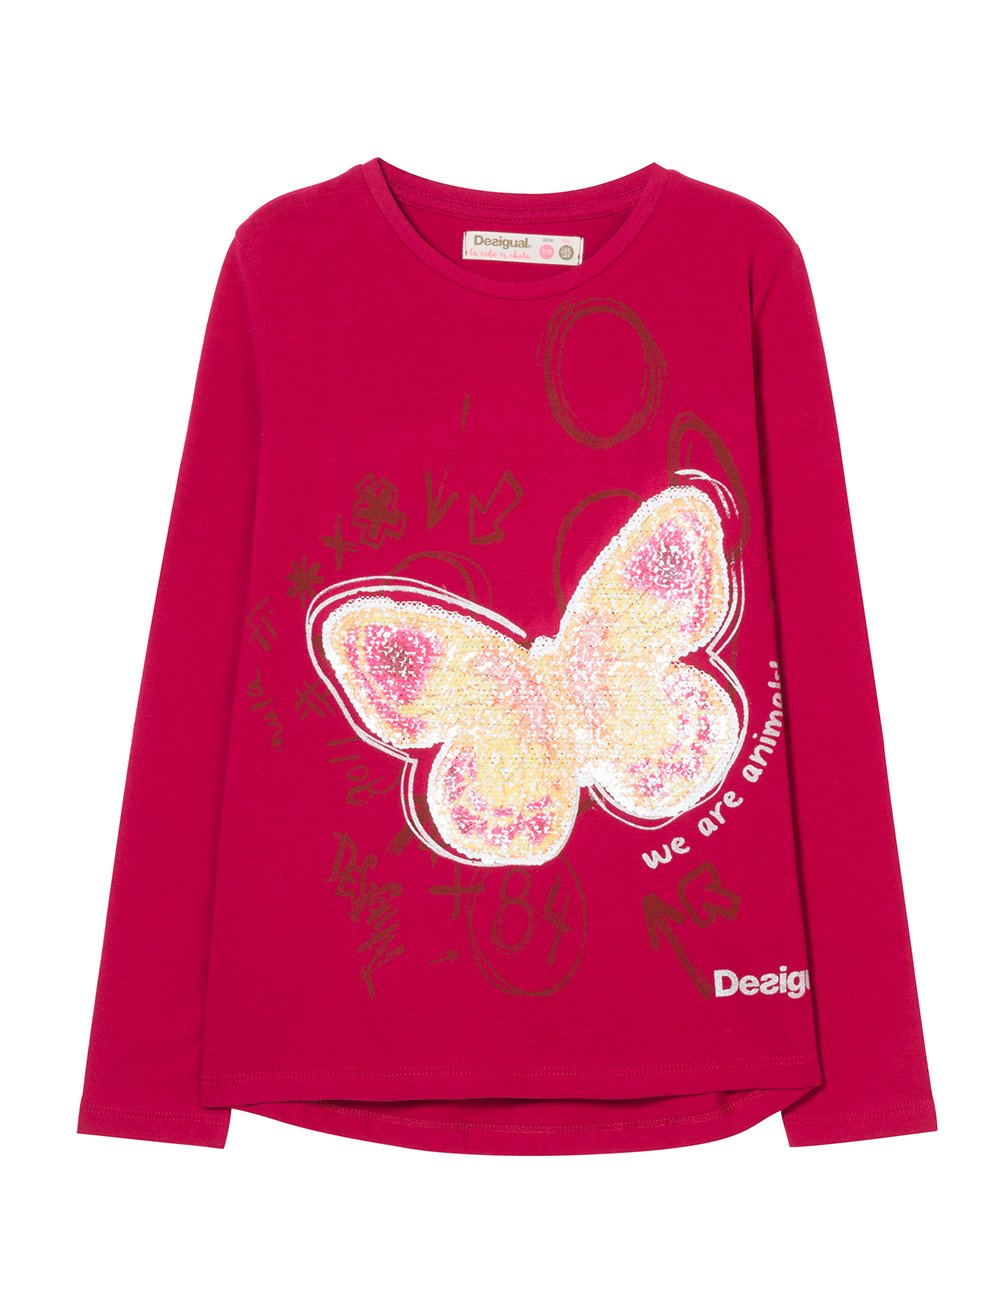 Desigual TS_Juneau Camiseta para Niñas